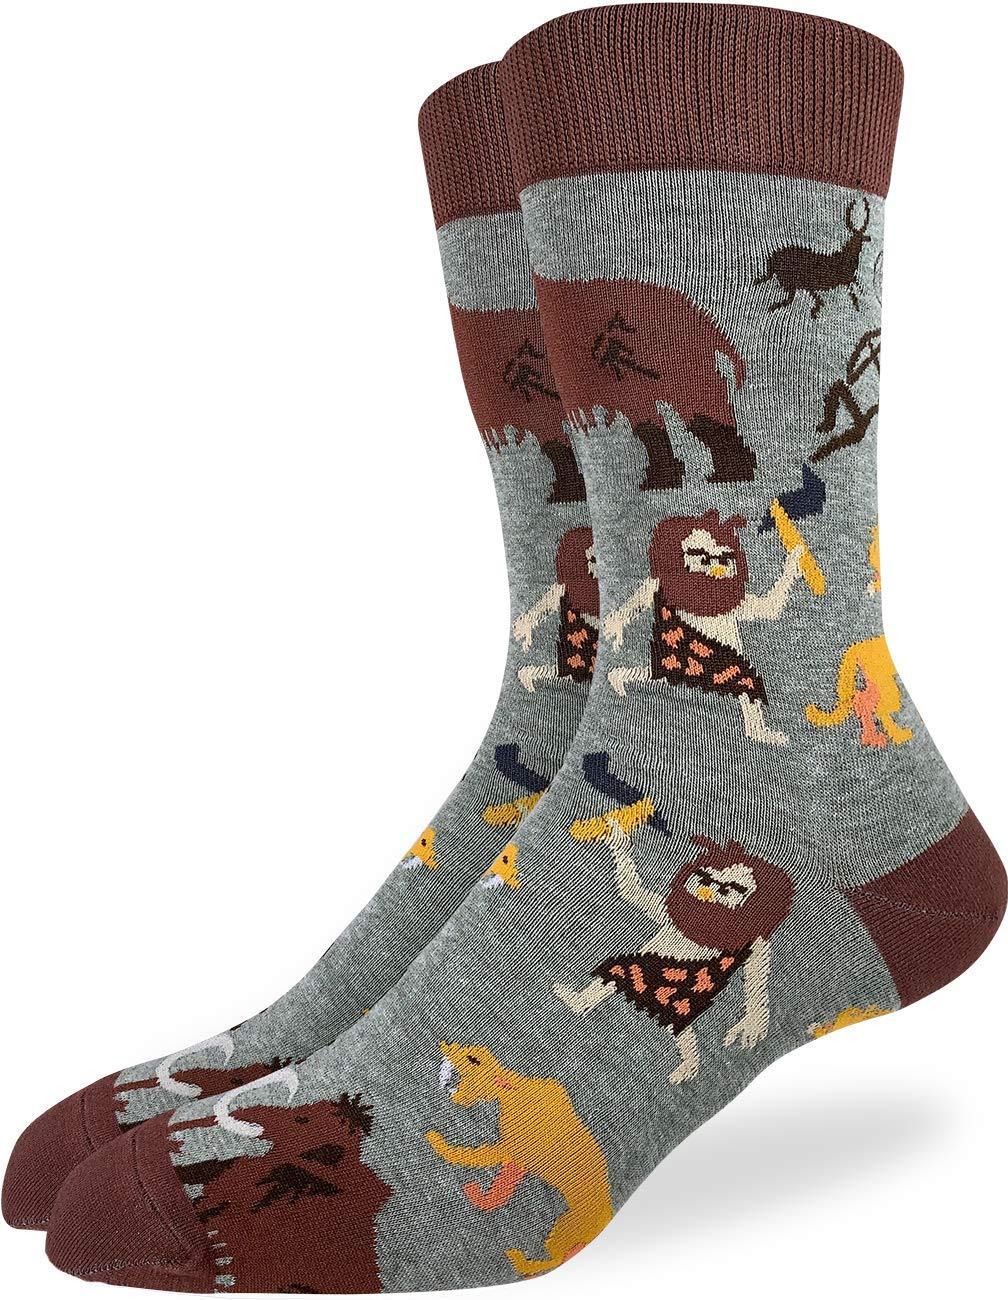 Good Luck Sock Men's Cavemen Socks - Green, Adult Shoe Size 7-12